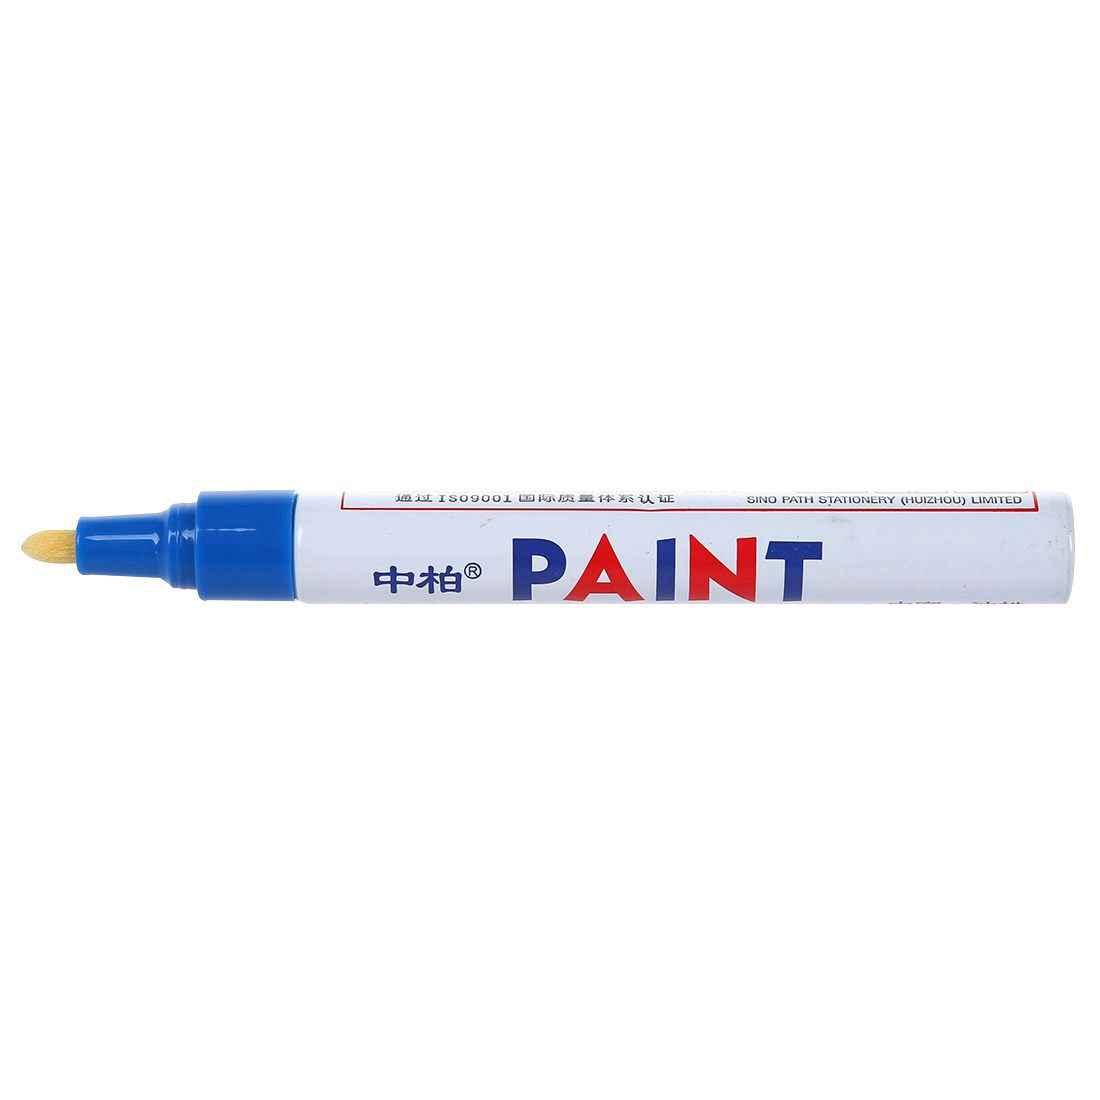 Sipa SP-110 Vilt-getipt marker verf pen permanente geregistreerde band marke auto motorfiets blauw